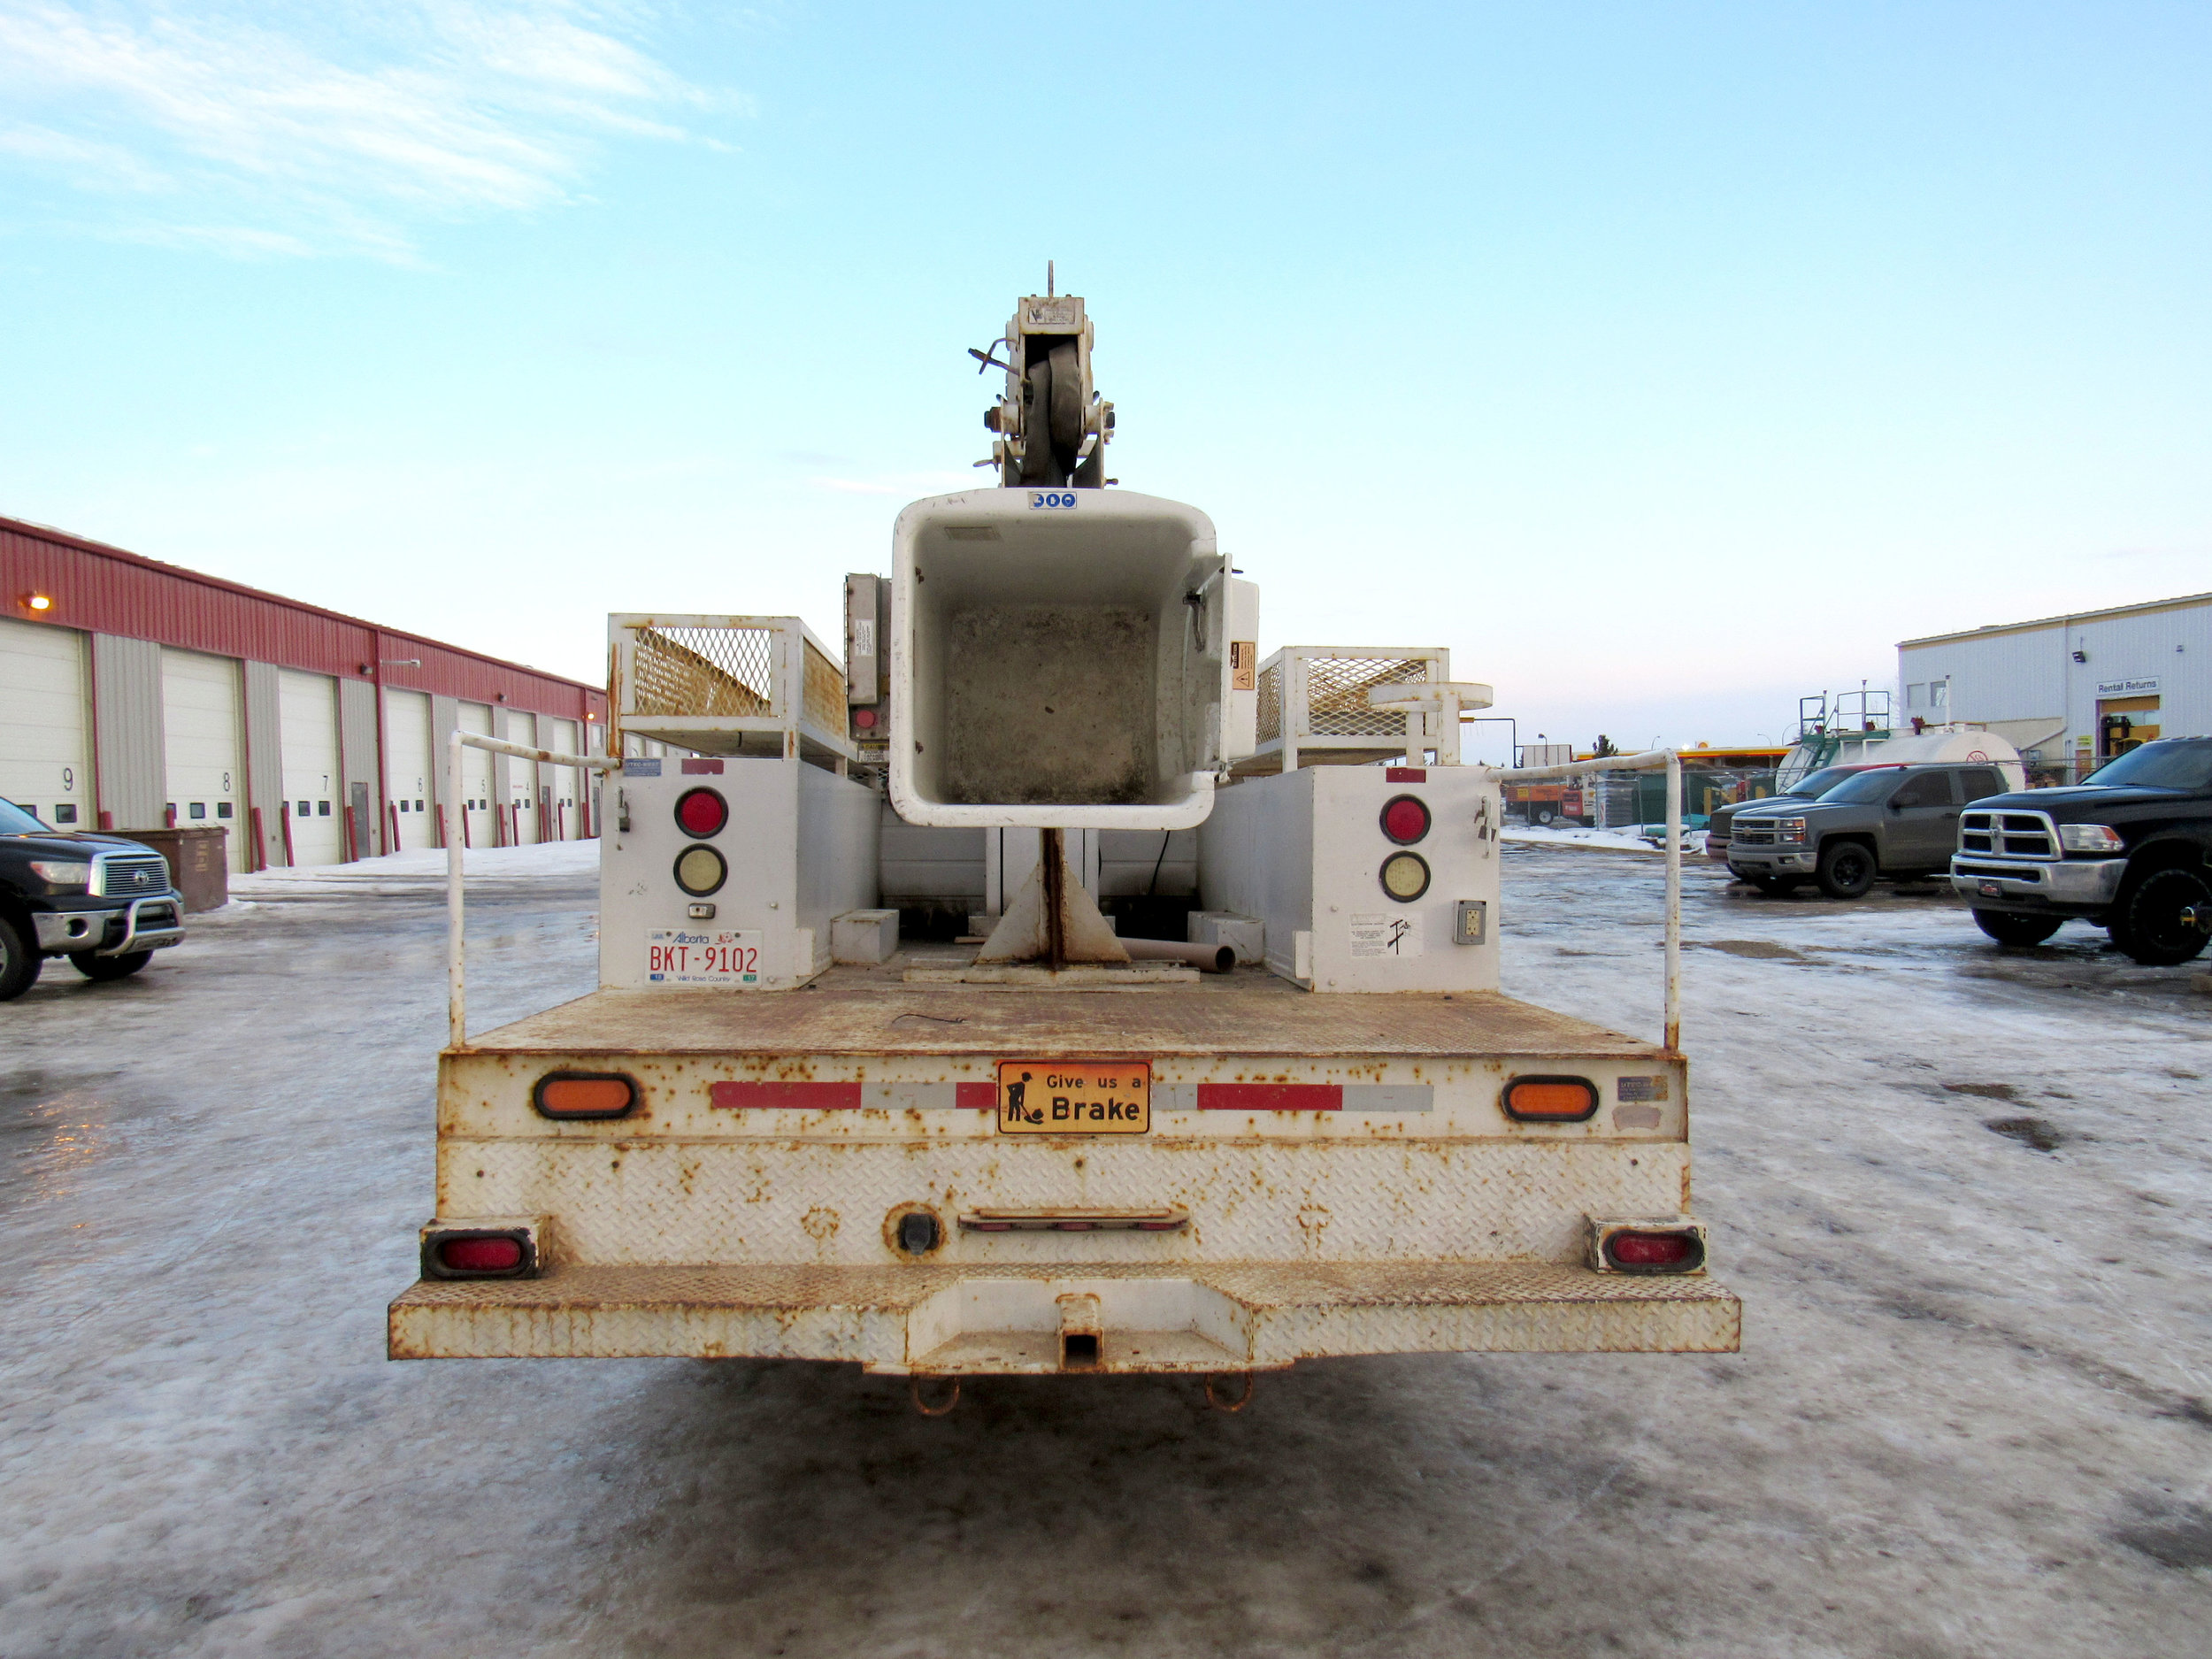 Lan Tech Services Grande Prairie Alberta Bucket Truck Commercial Equipment Rentals